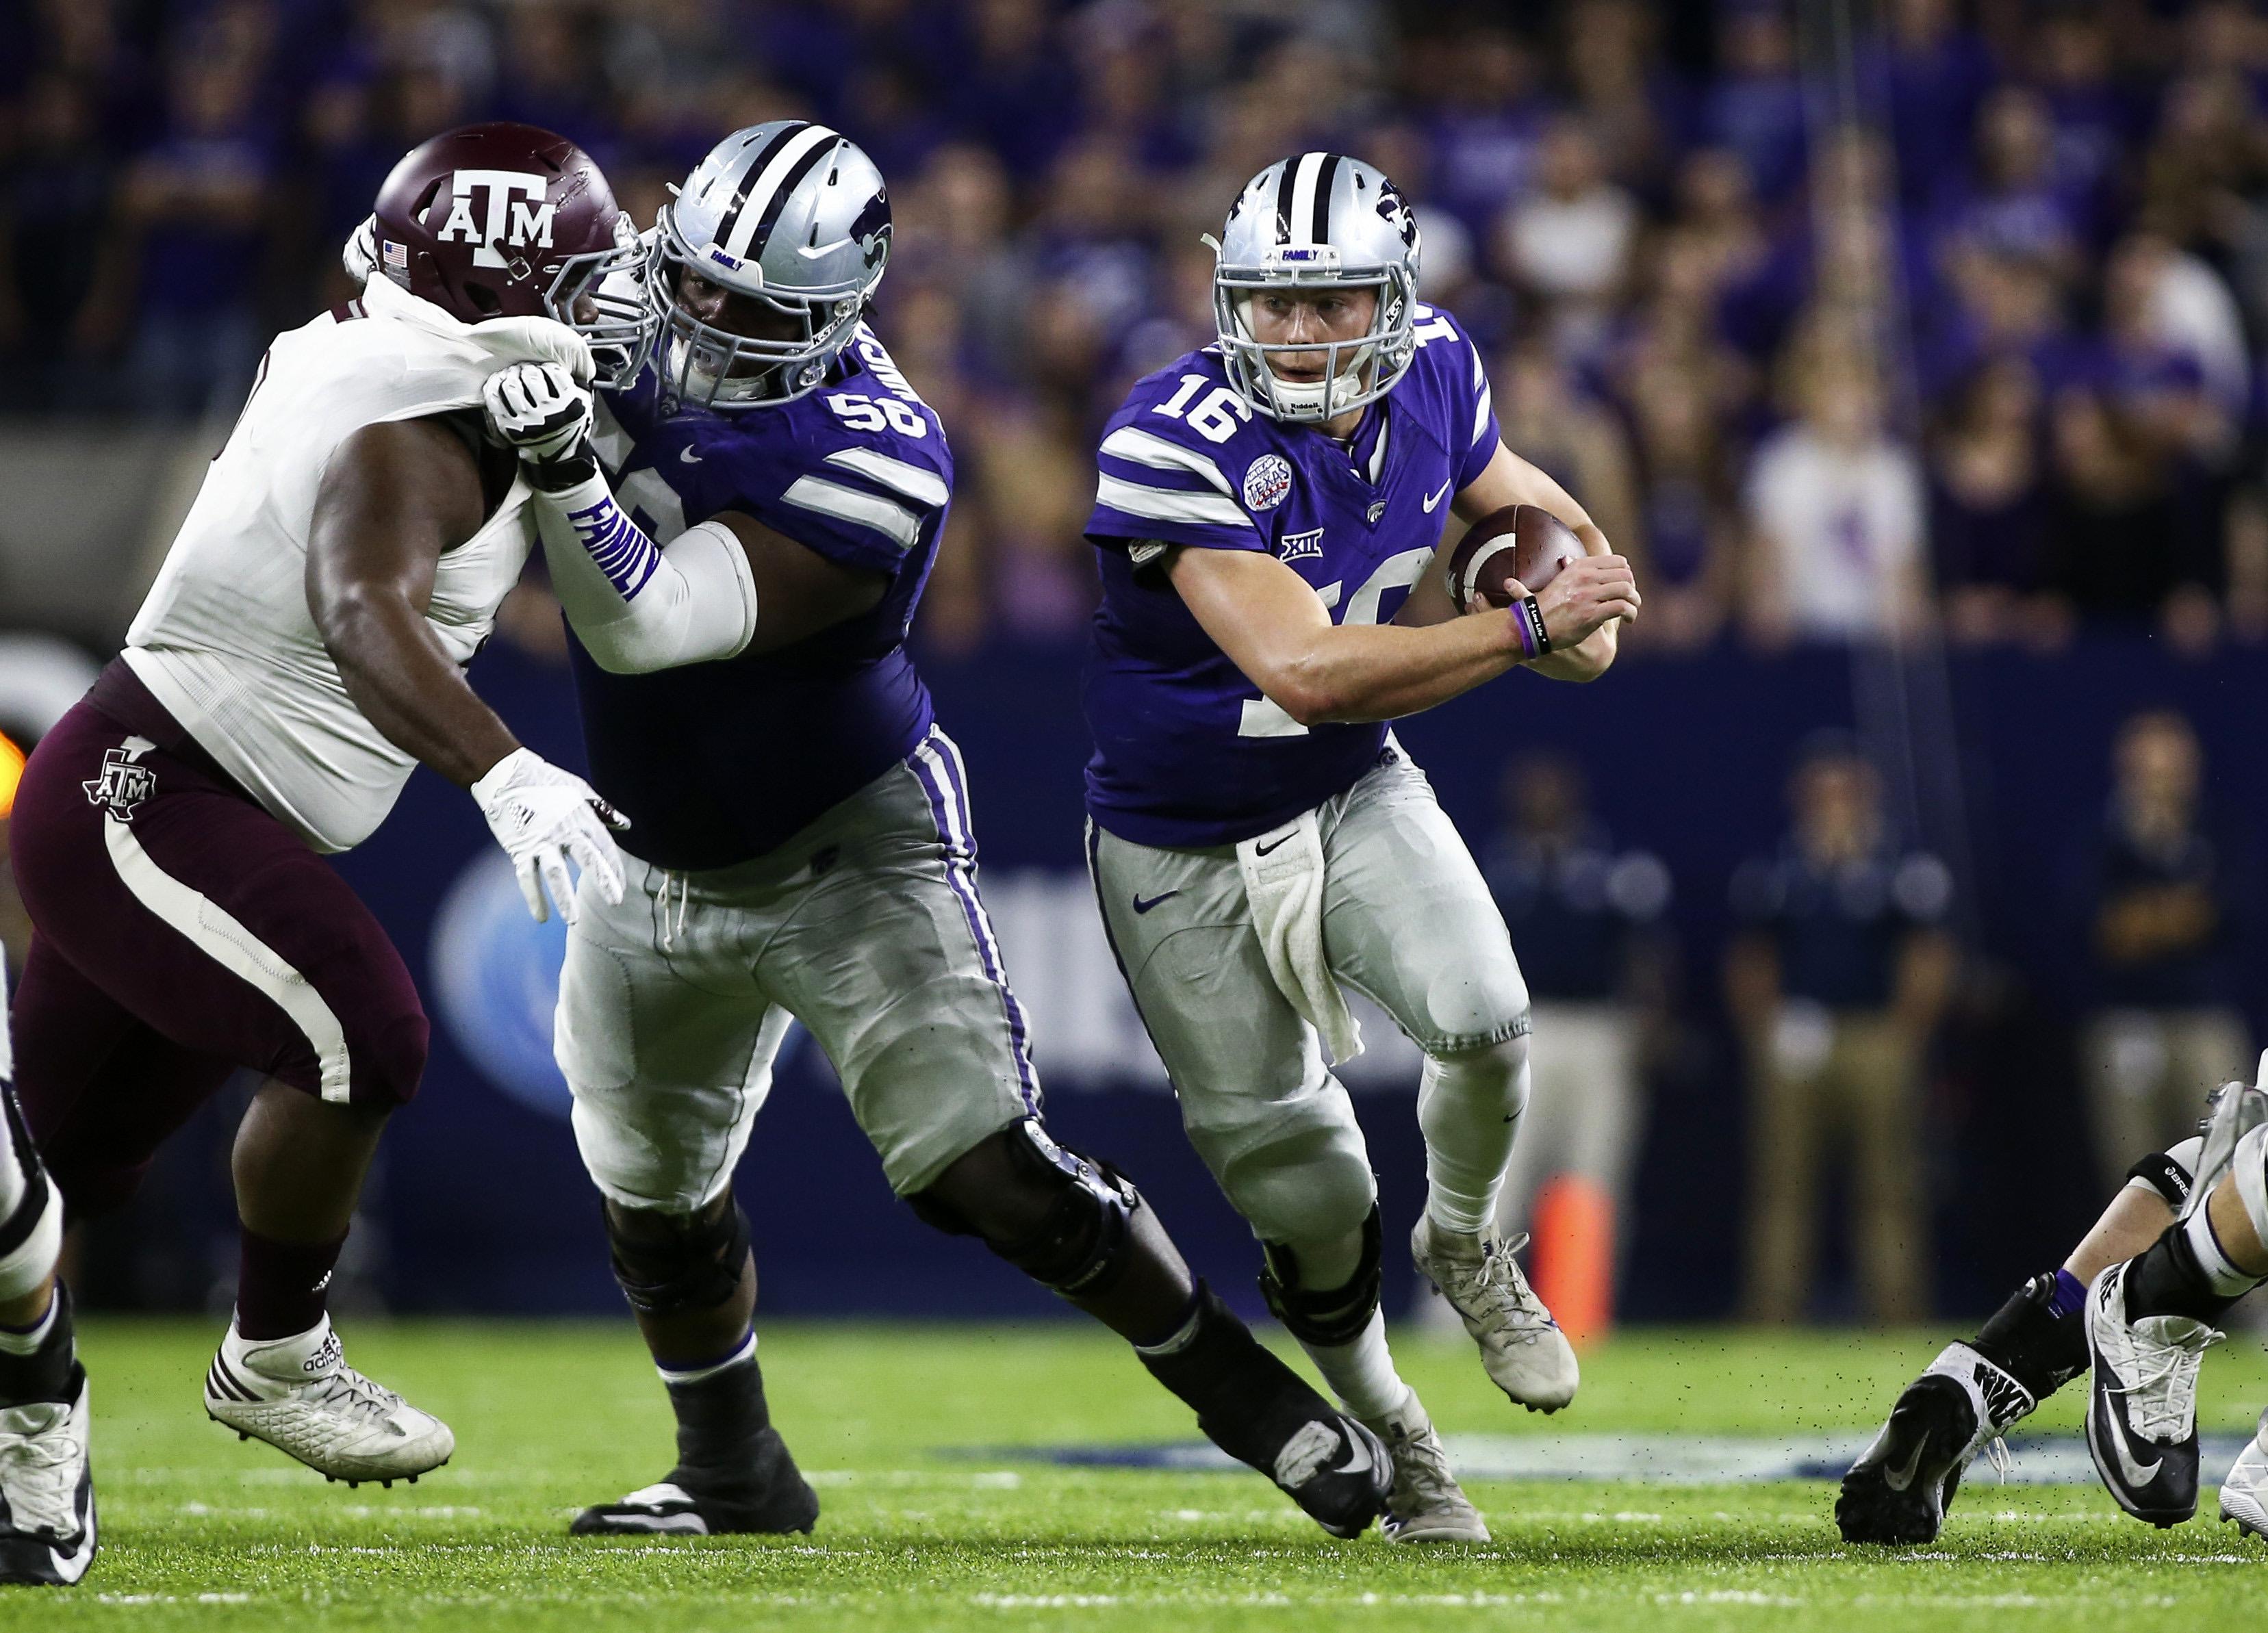 9773426-ncaa-football-texas-bowl-kansas-state-vs-texas-aampampm